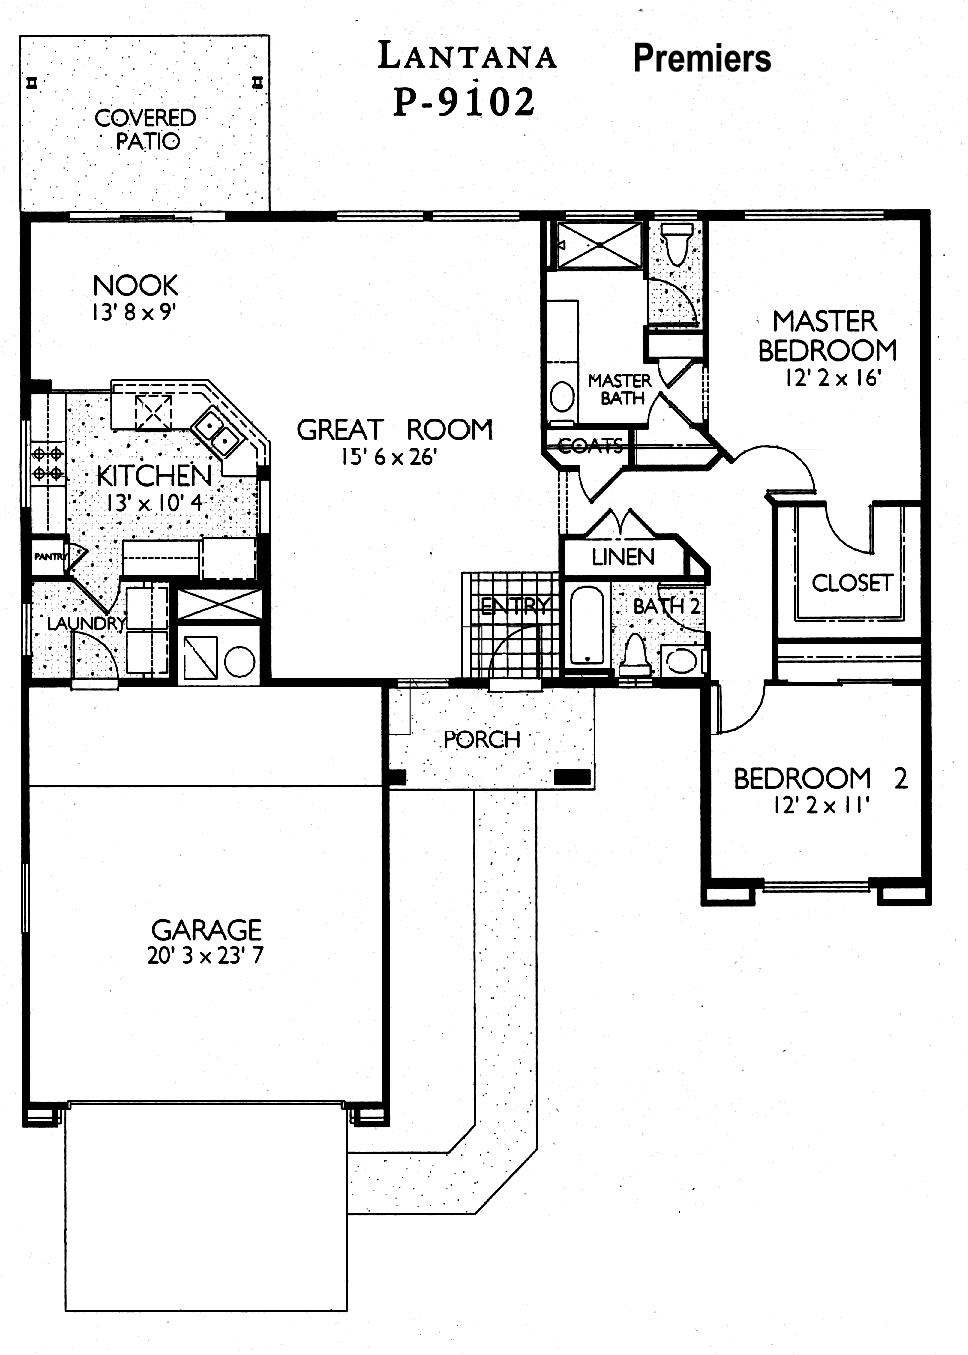 Sun City Grand Lantana floor plan, Del Webb Sun City Grand Floor Plan Model Home House Plans Floorplans Models in Surprise Phoenix Arizona AZ Ken Meade Realty Kathy Anderson